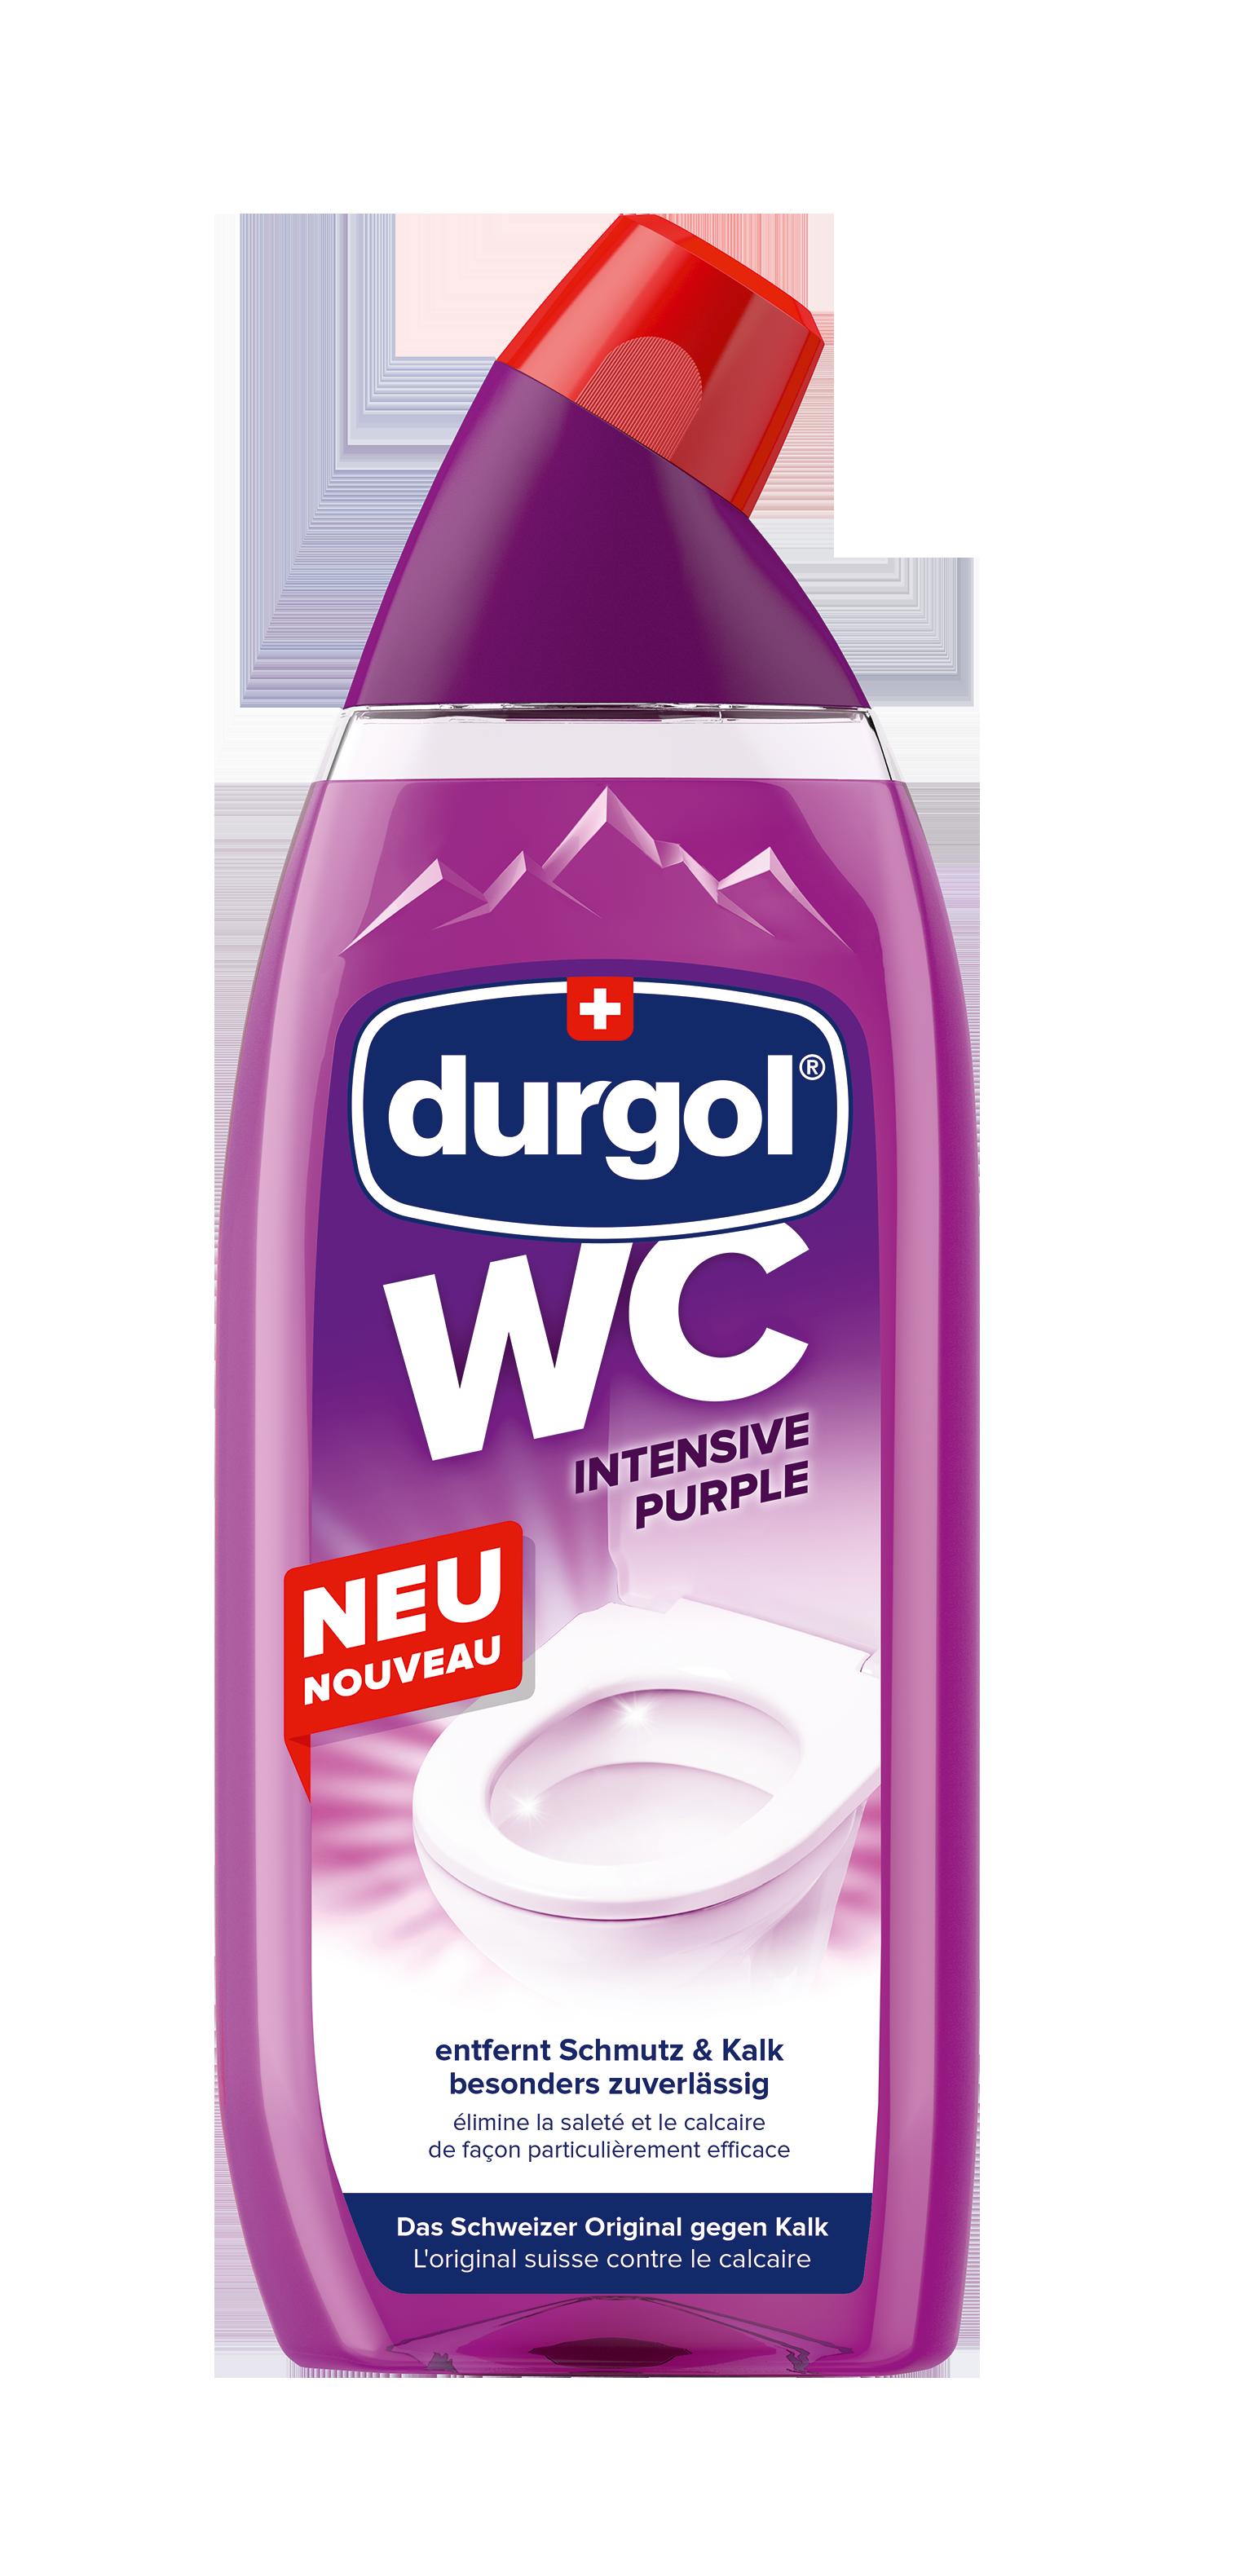 durgol WC Intensive Purple